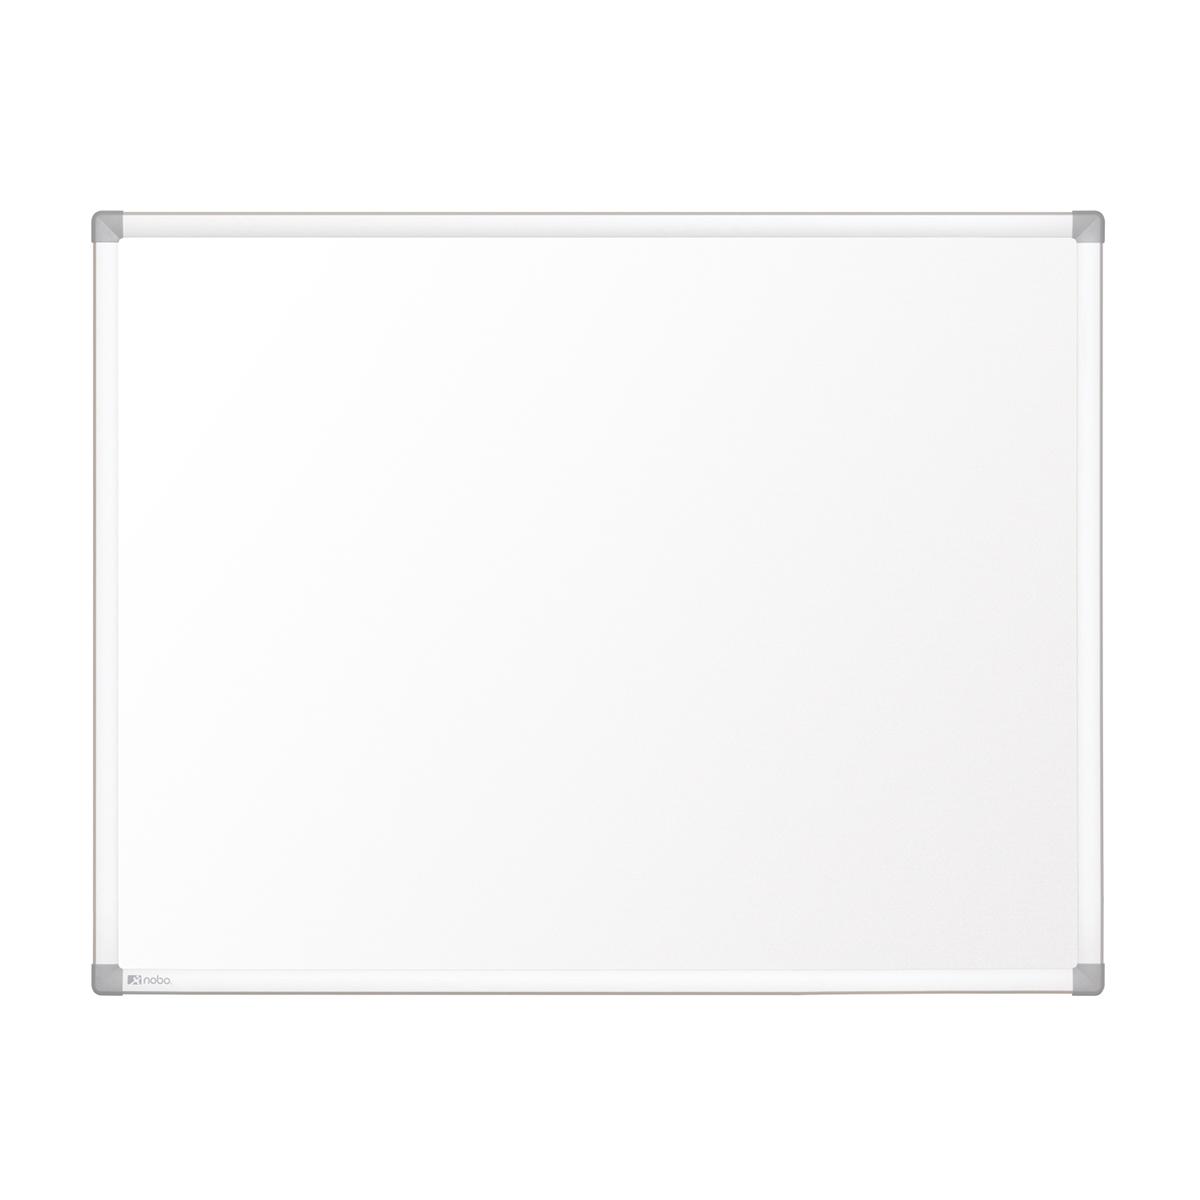 Nobo 1905221 Prestige Enamel Magnetic Whiteboard 1200 x 900mm